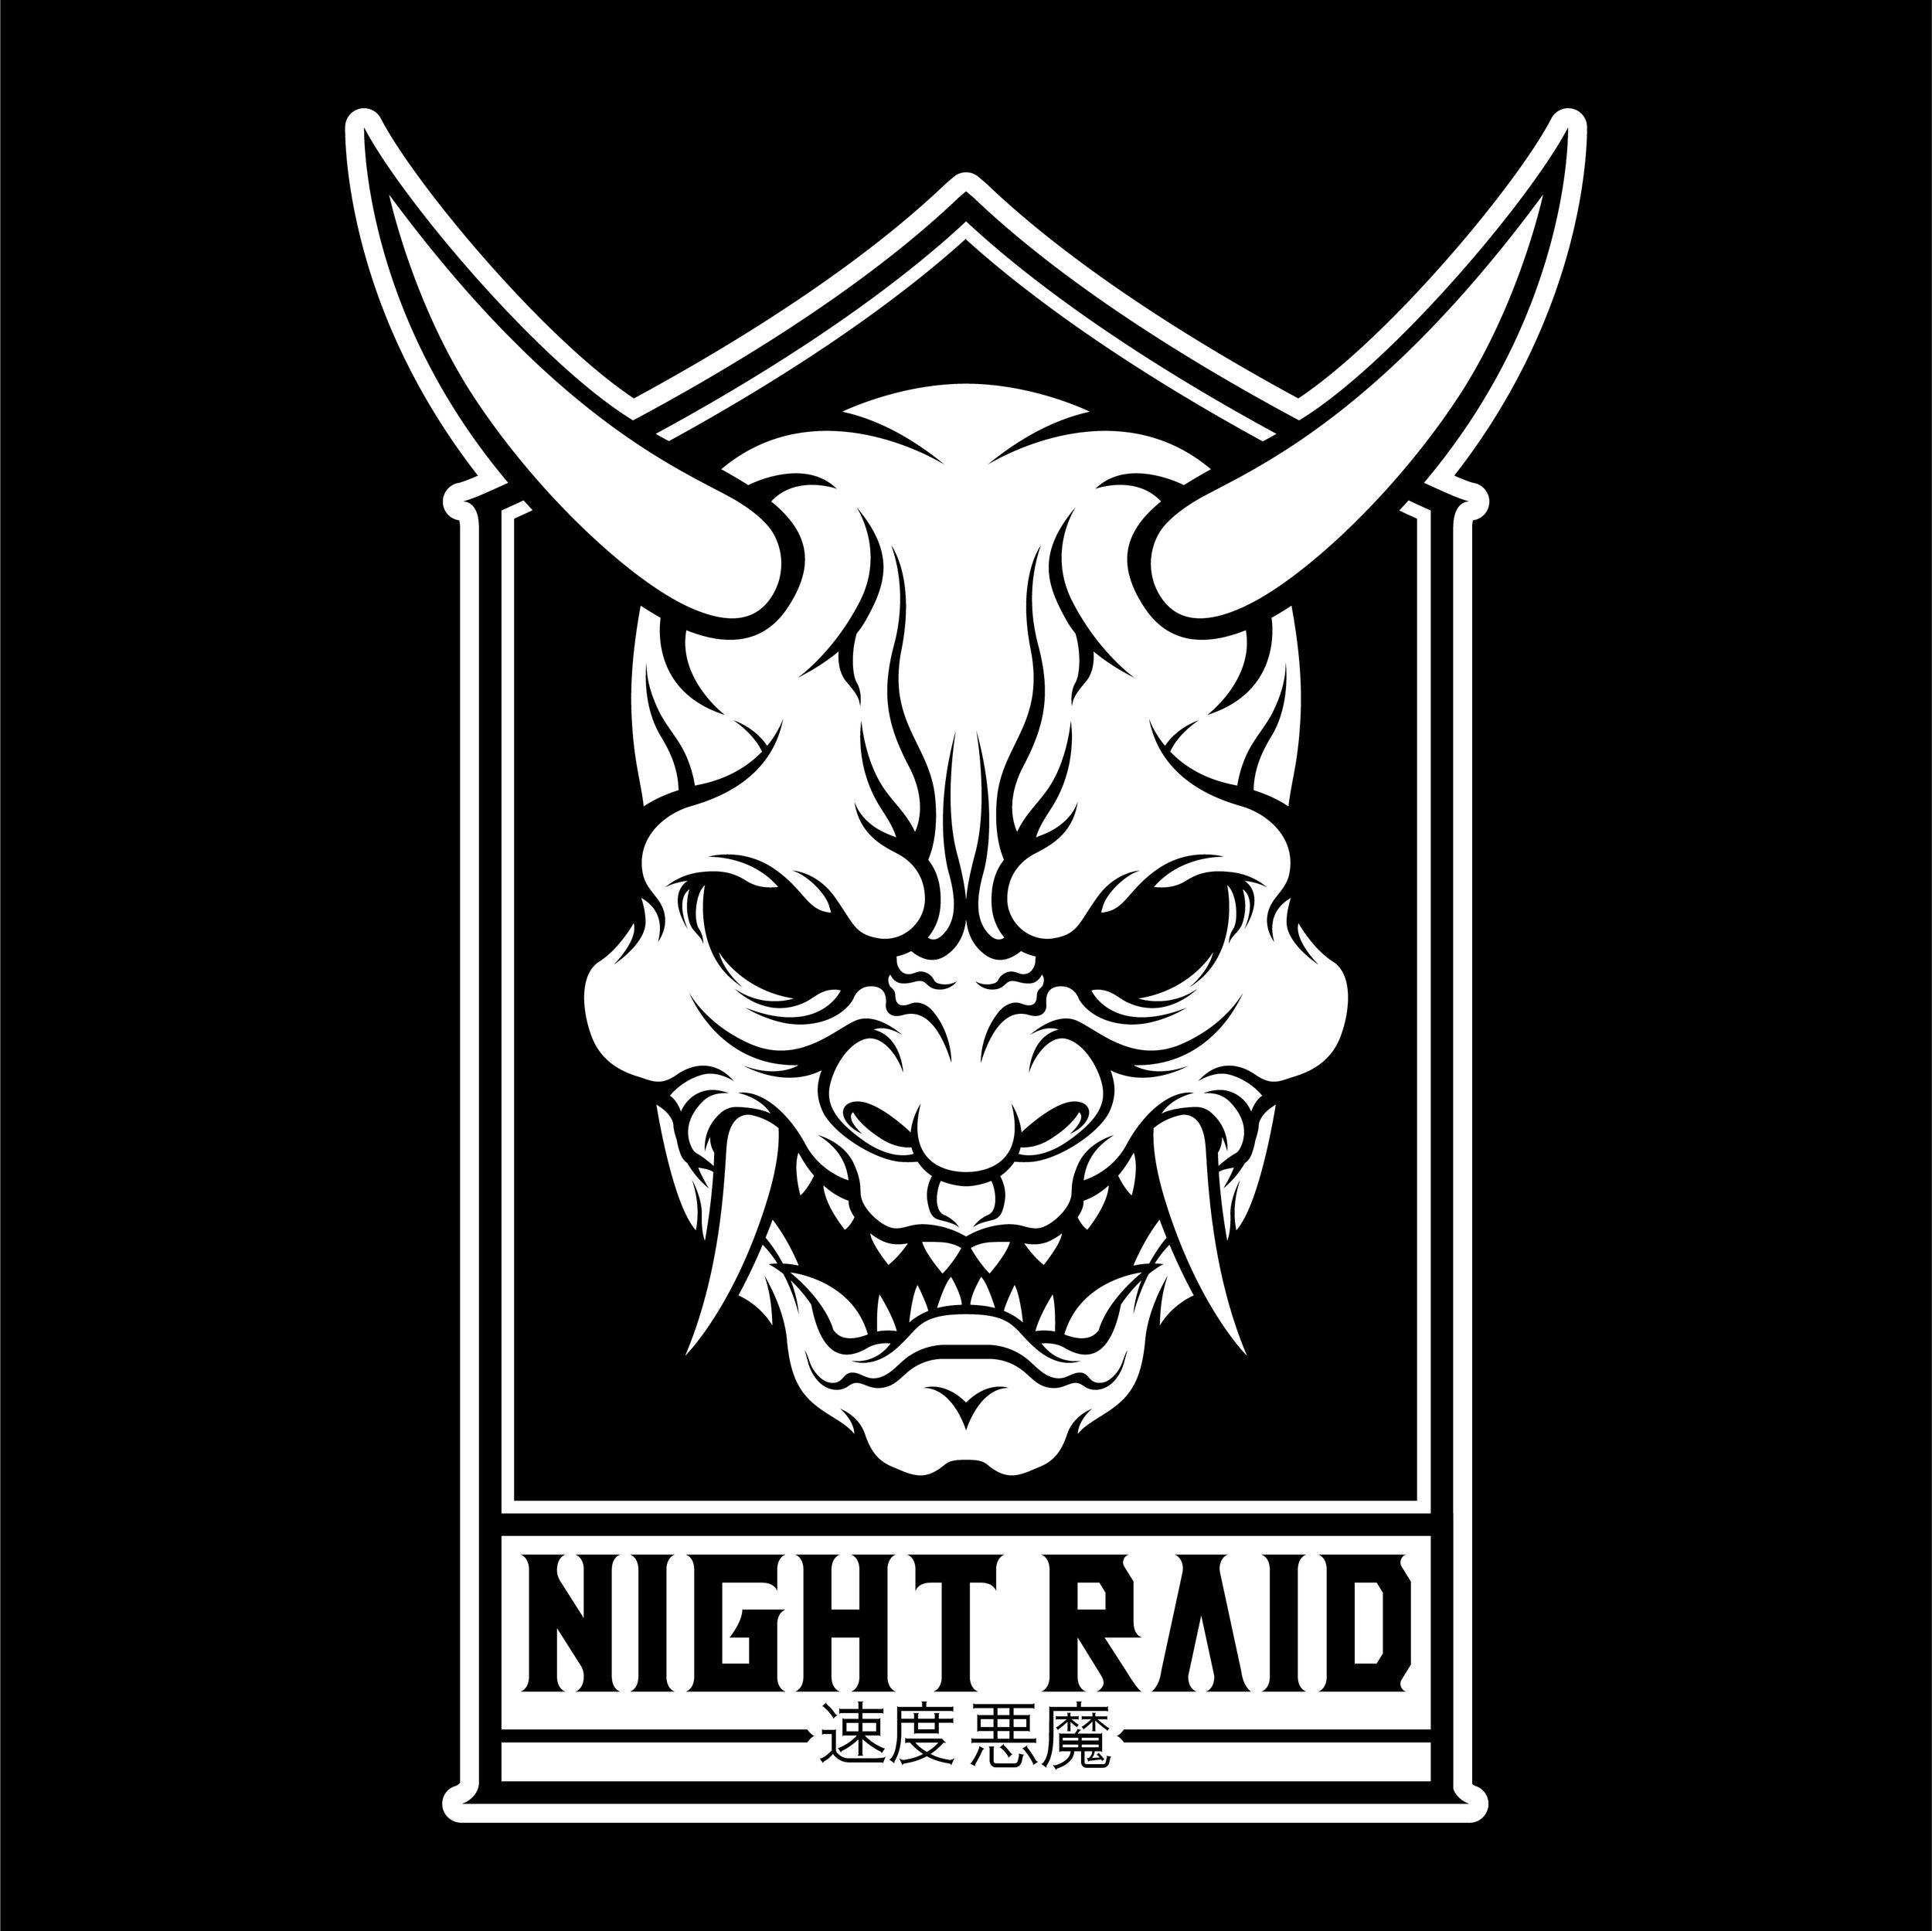 nightraid-orozcodesign-onimask-logo-1.jpg